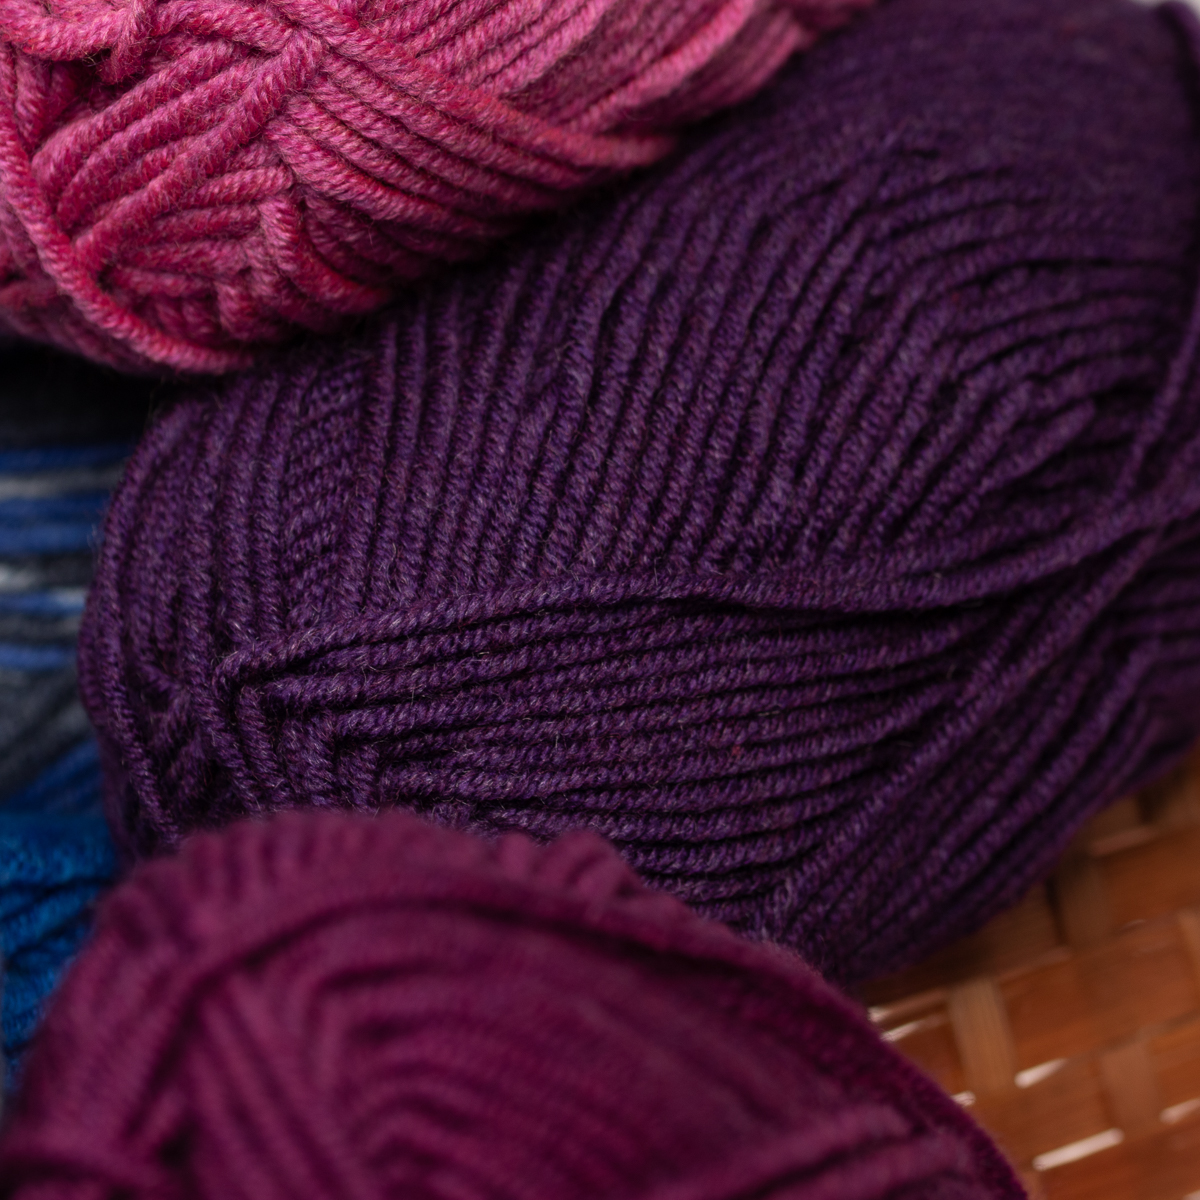 3pk-Lion-Brand-Woolspun-Acrylic-amp-Wool-Yarn-Bulky-5-Knit-Crocheting-Skeins-Soft thumbnail 54